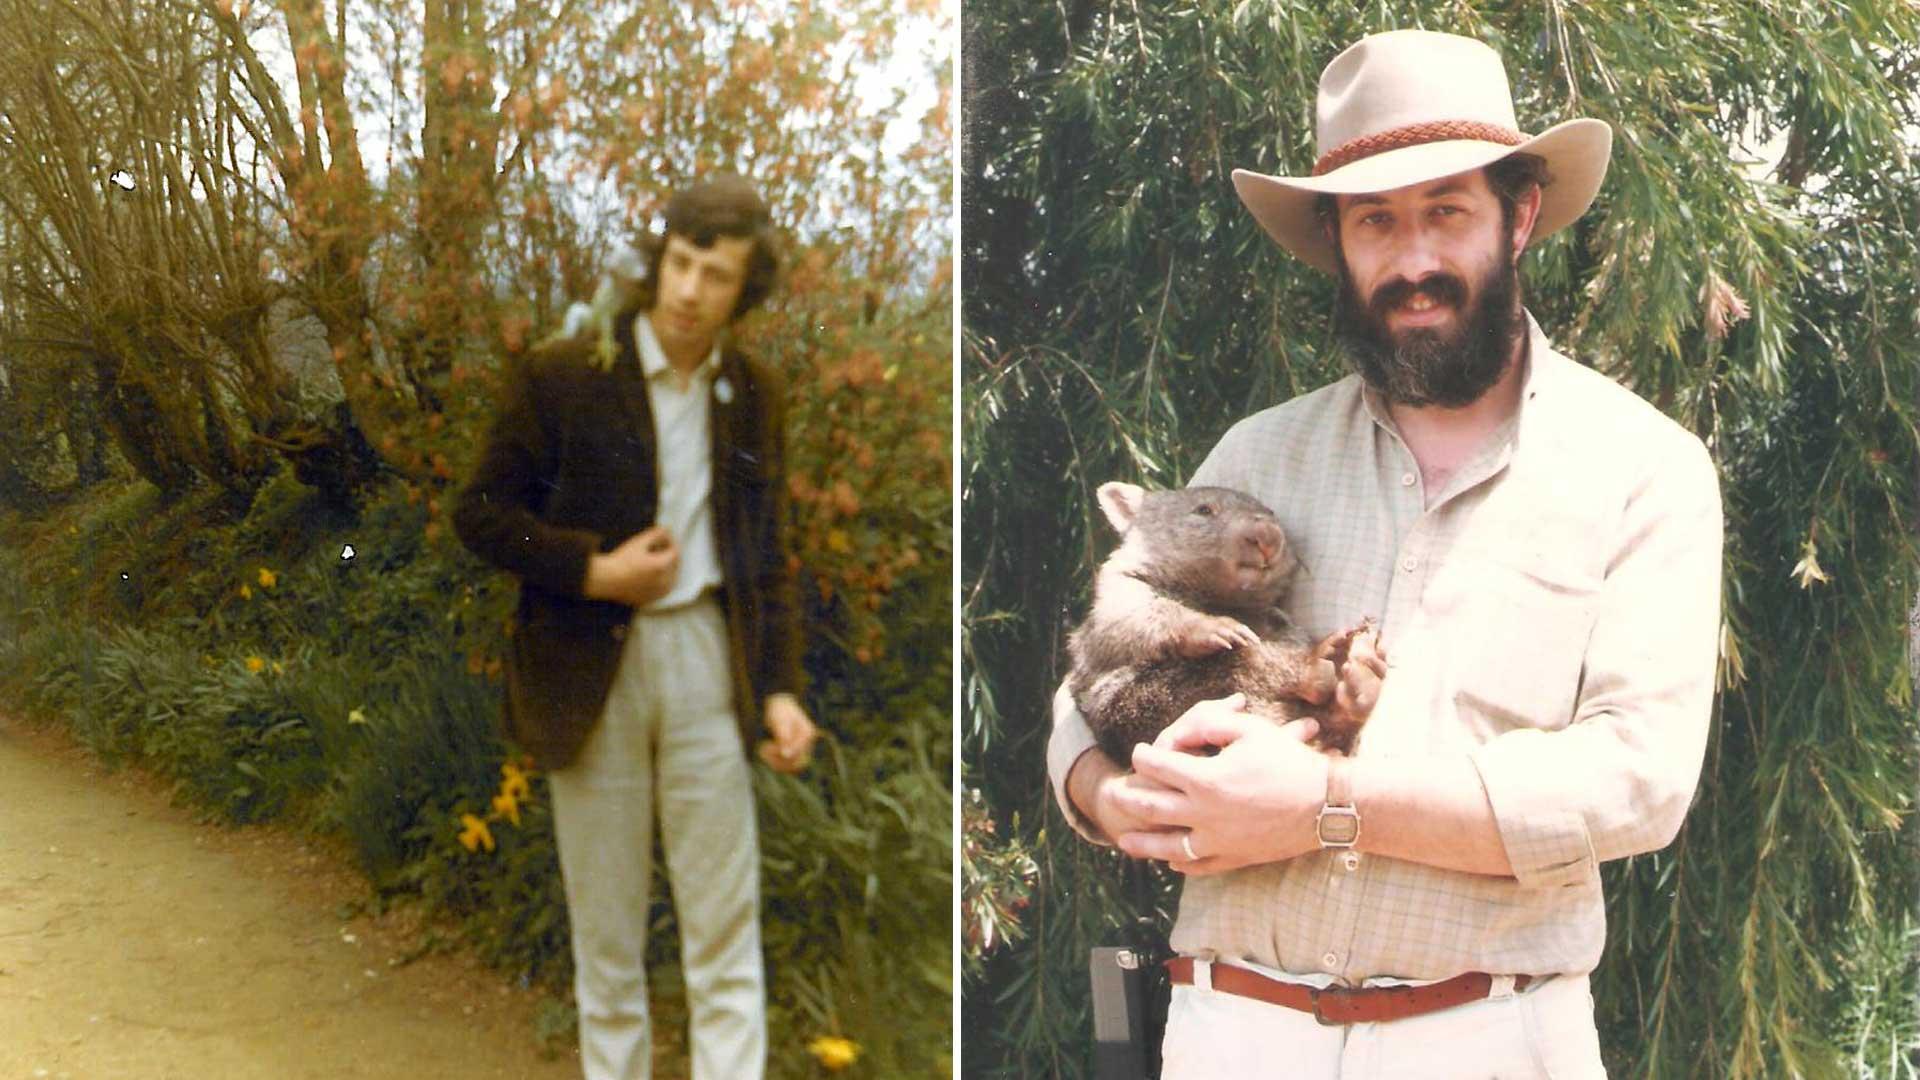 https://rfacdn.nz/zoo/assets/media/richard-kakapo-gallery-5.jpg